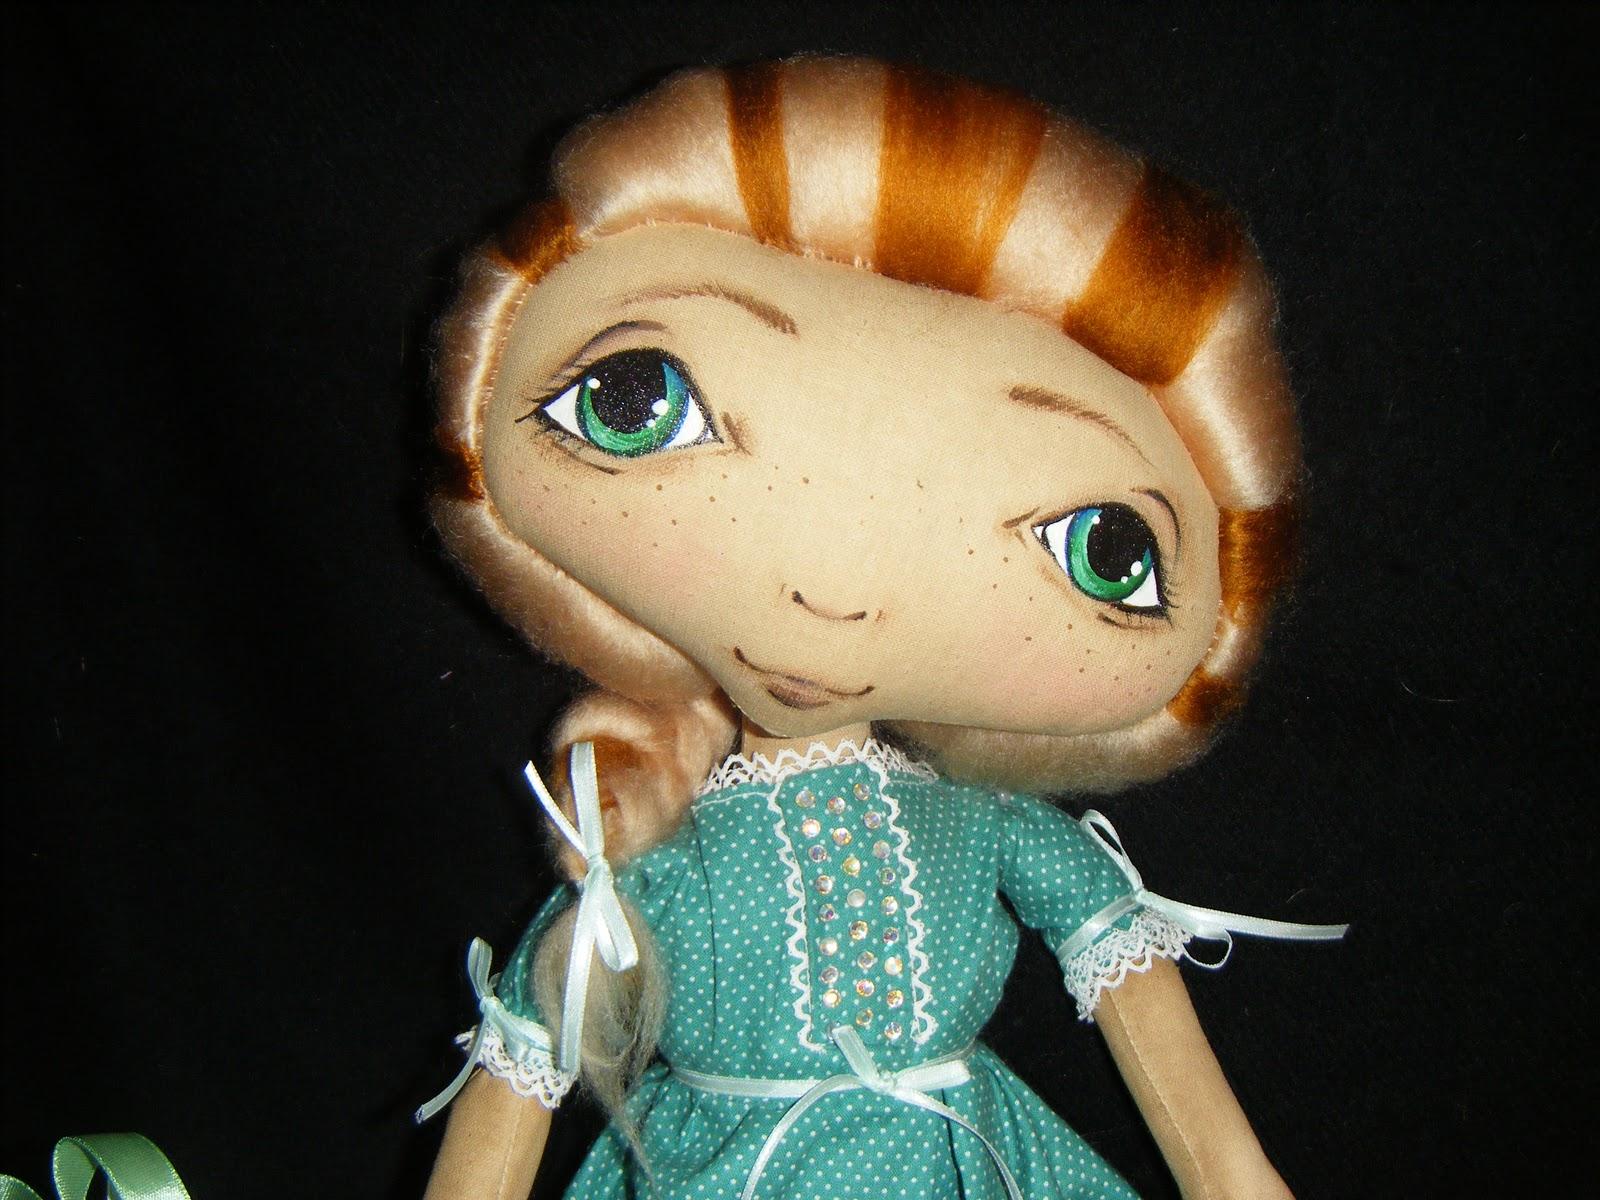 Как сделать у куклы кудри